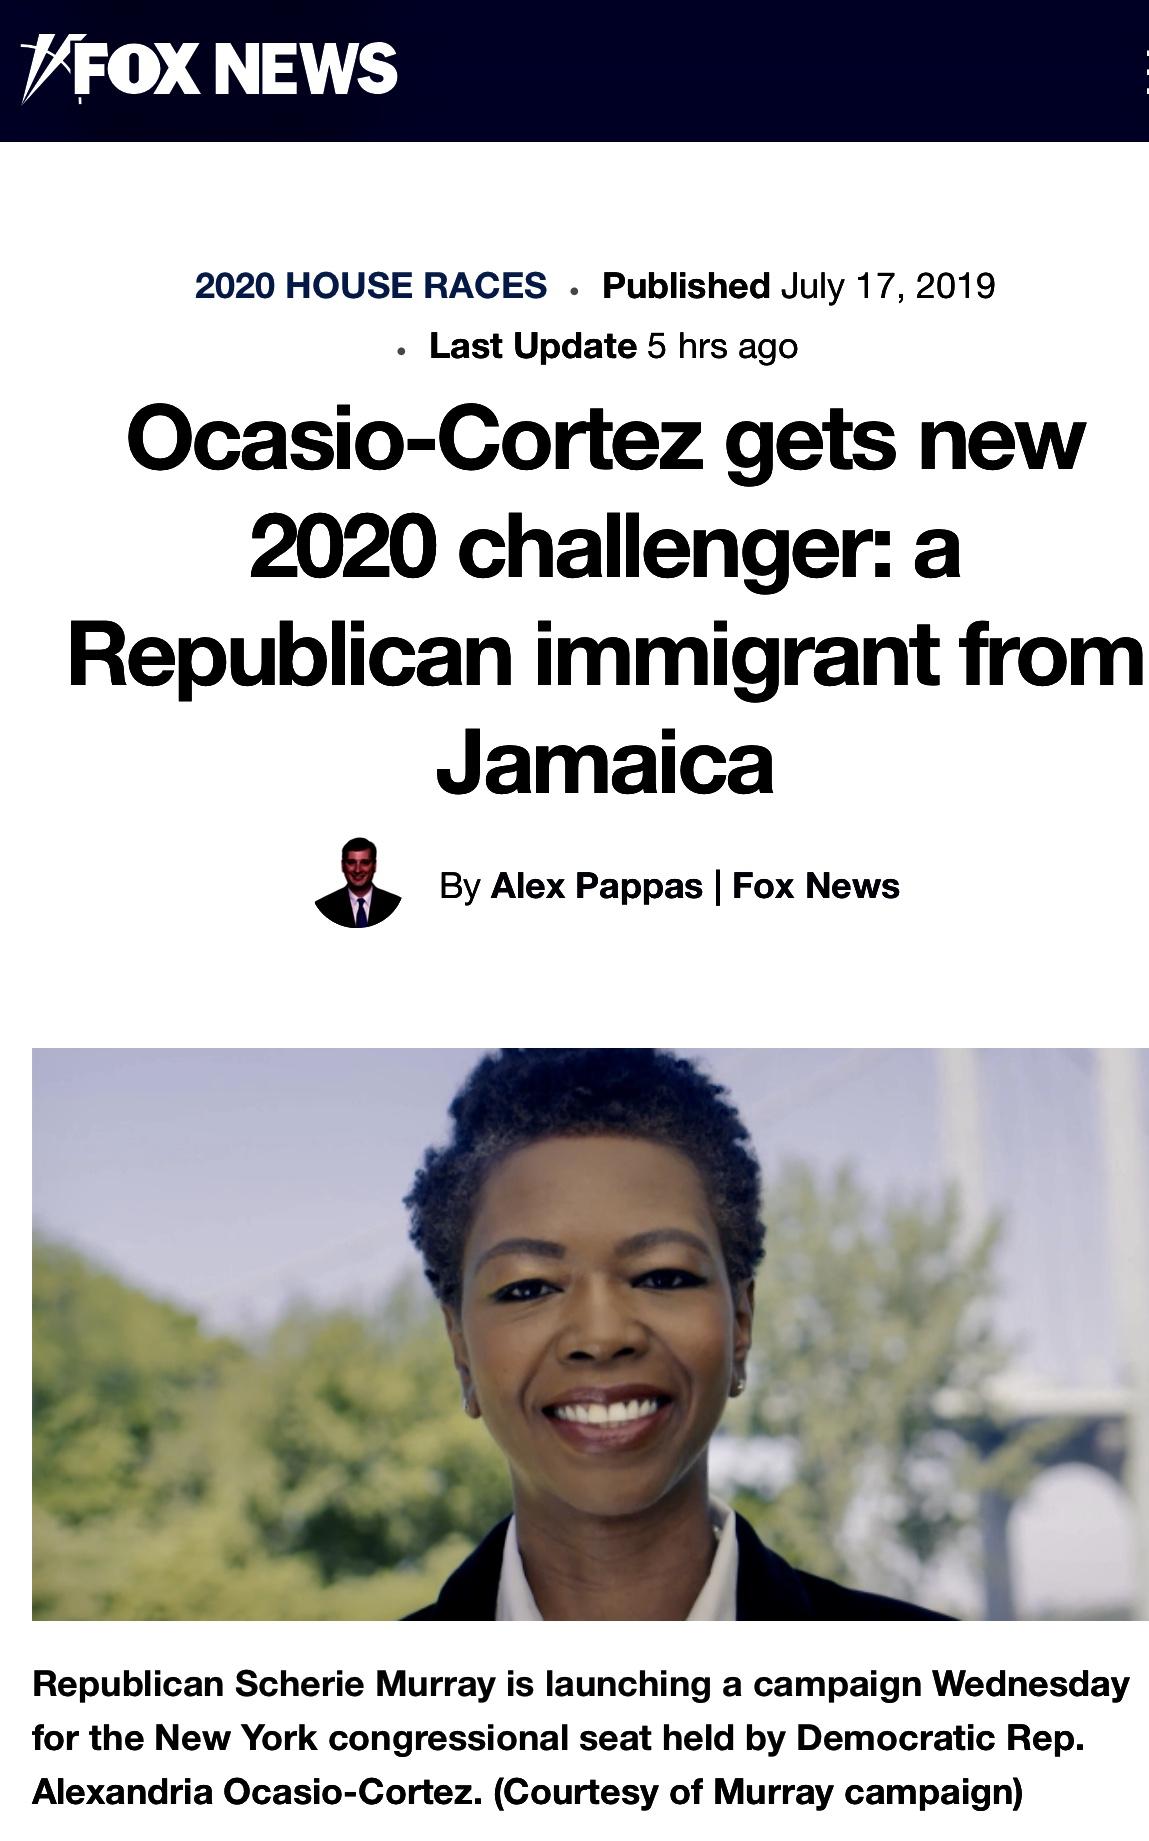 Ocasio-Cortez gets new 2020 challenger: Scherie Murray a Republican immigrant from Jamaica | Fox News